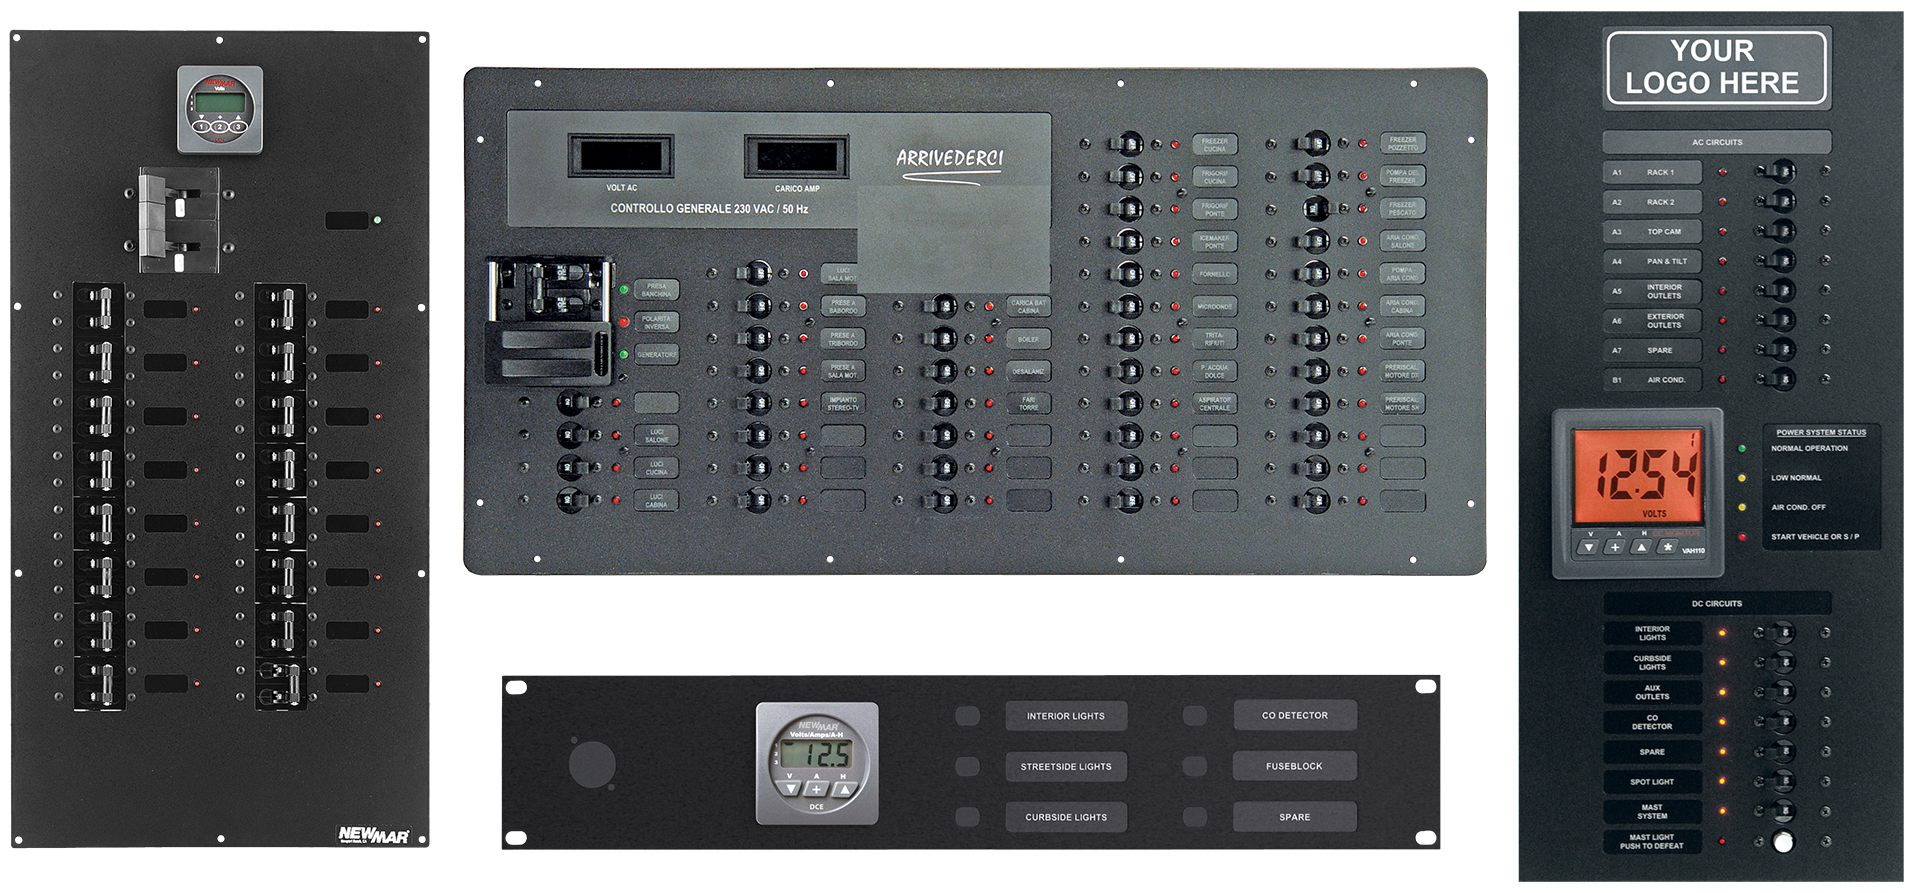 Custom_Electrical_Panels